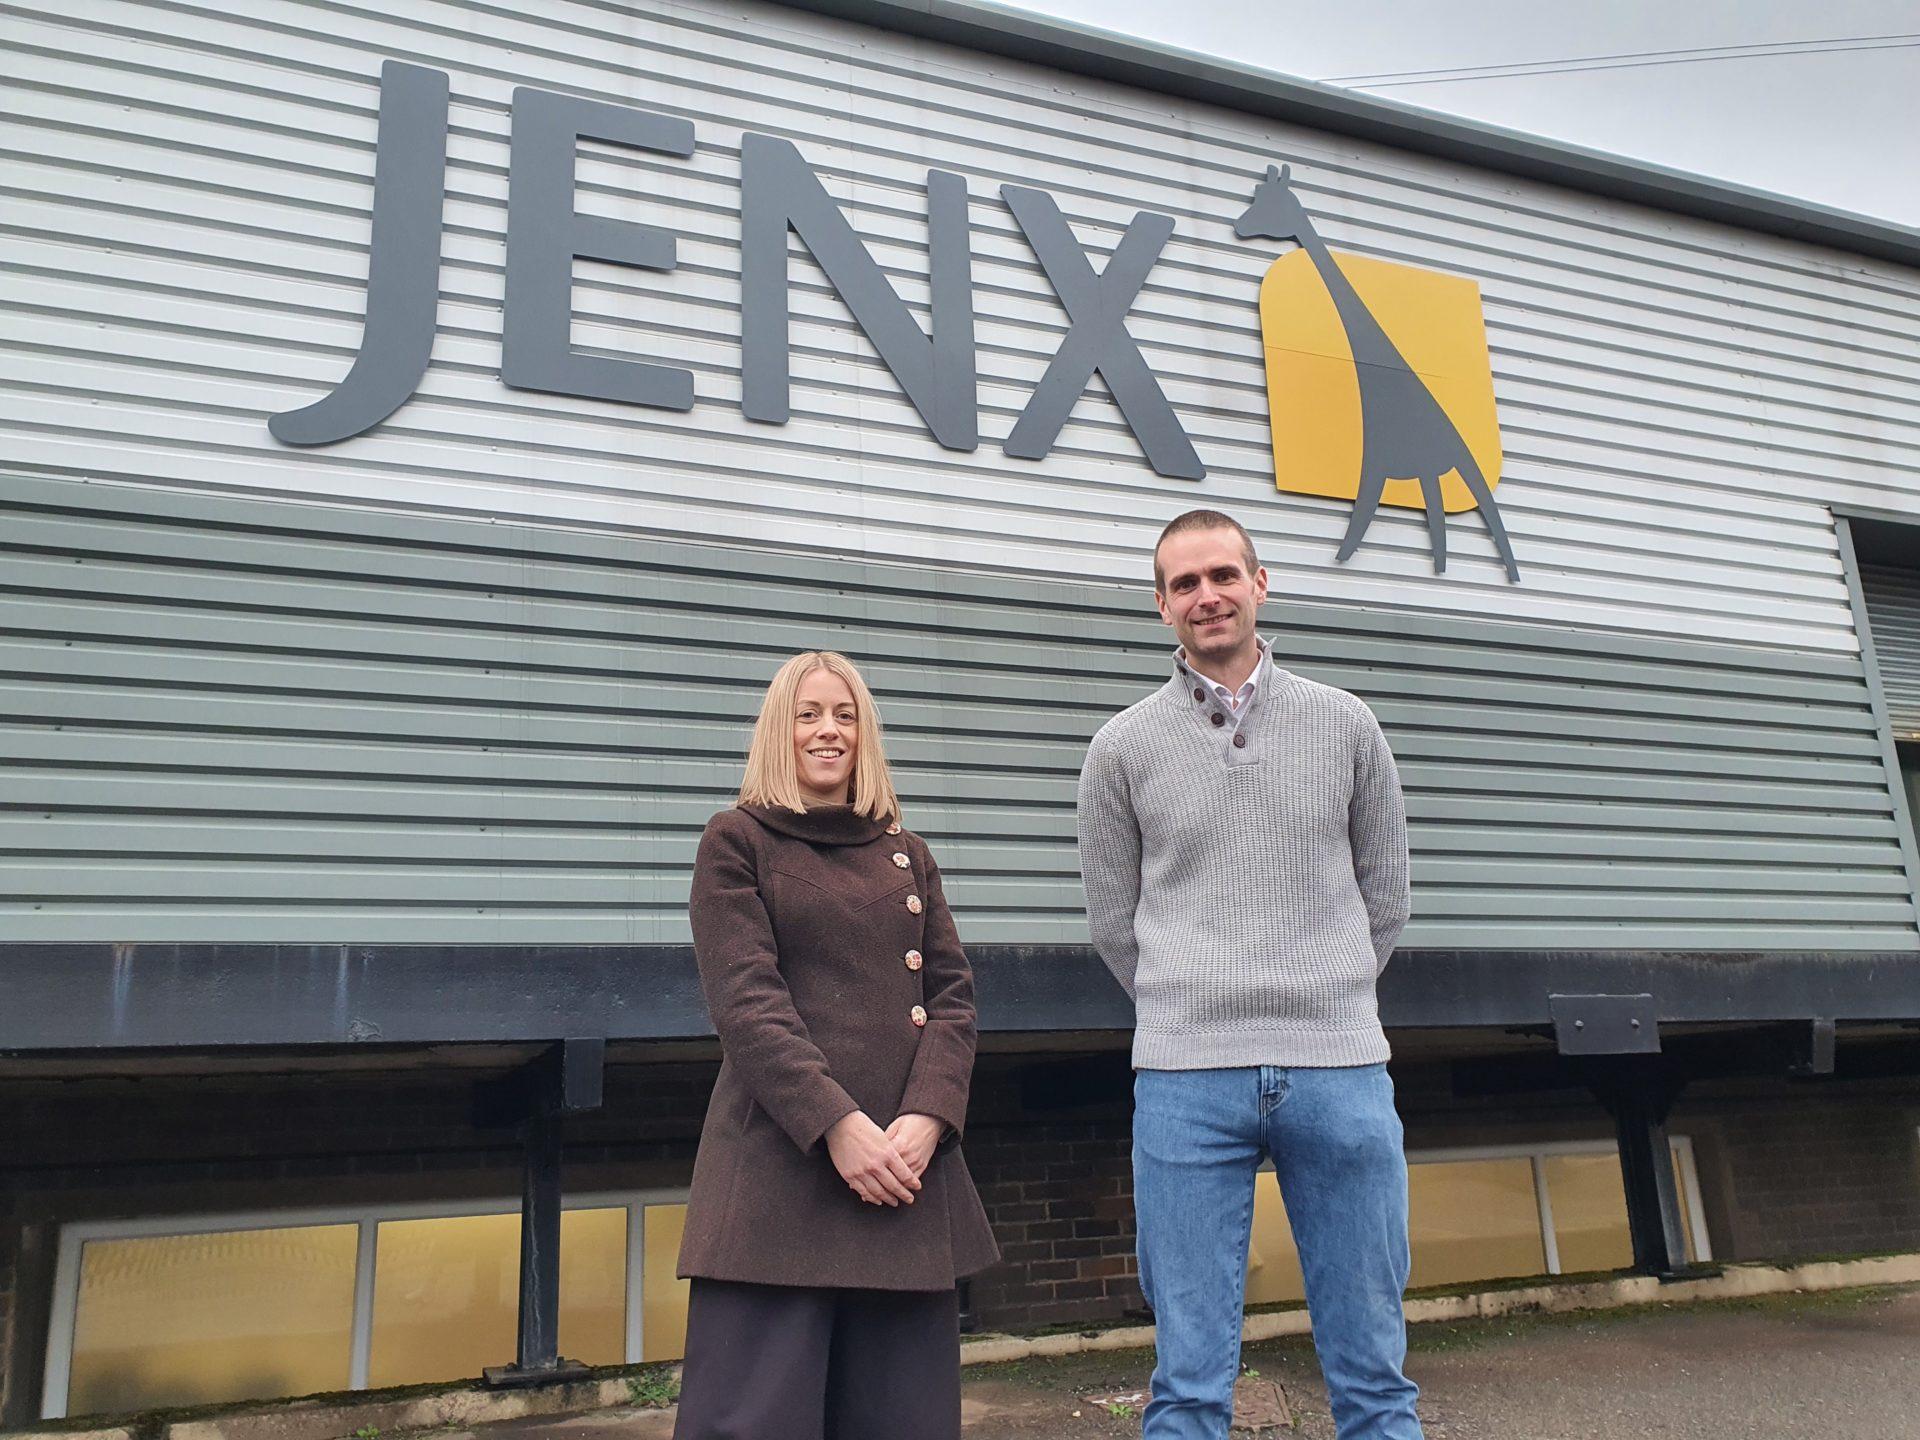 Holly Jenkins and Dan Limb